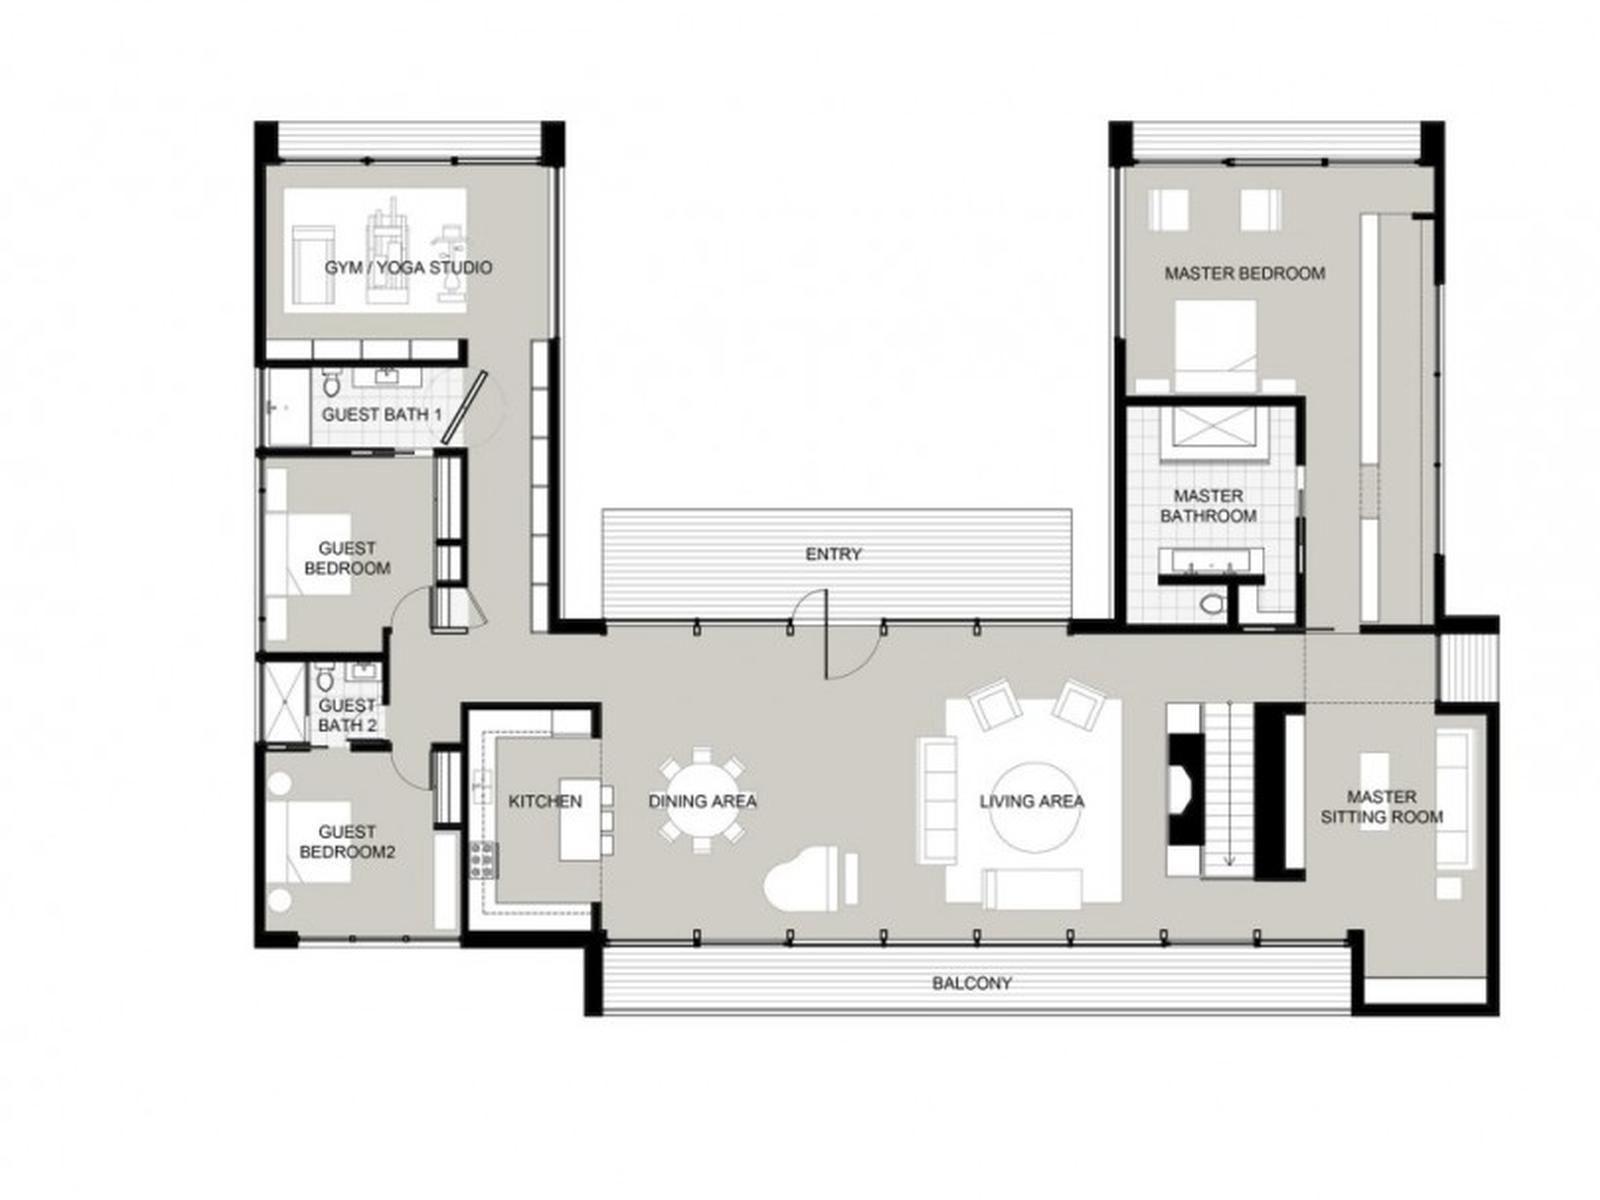 U Shaped House Floor Plans Dazzling Design Inspiration 16 Ideas